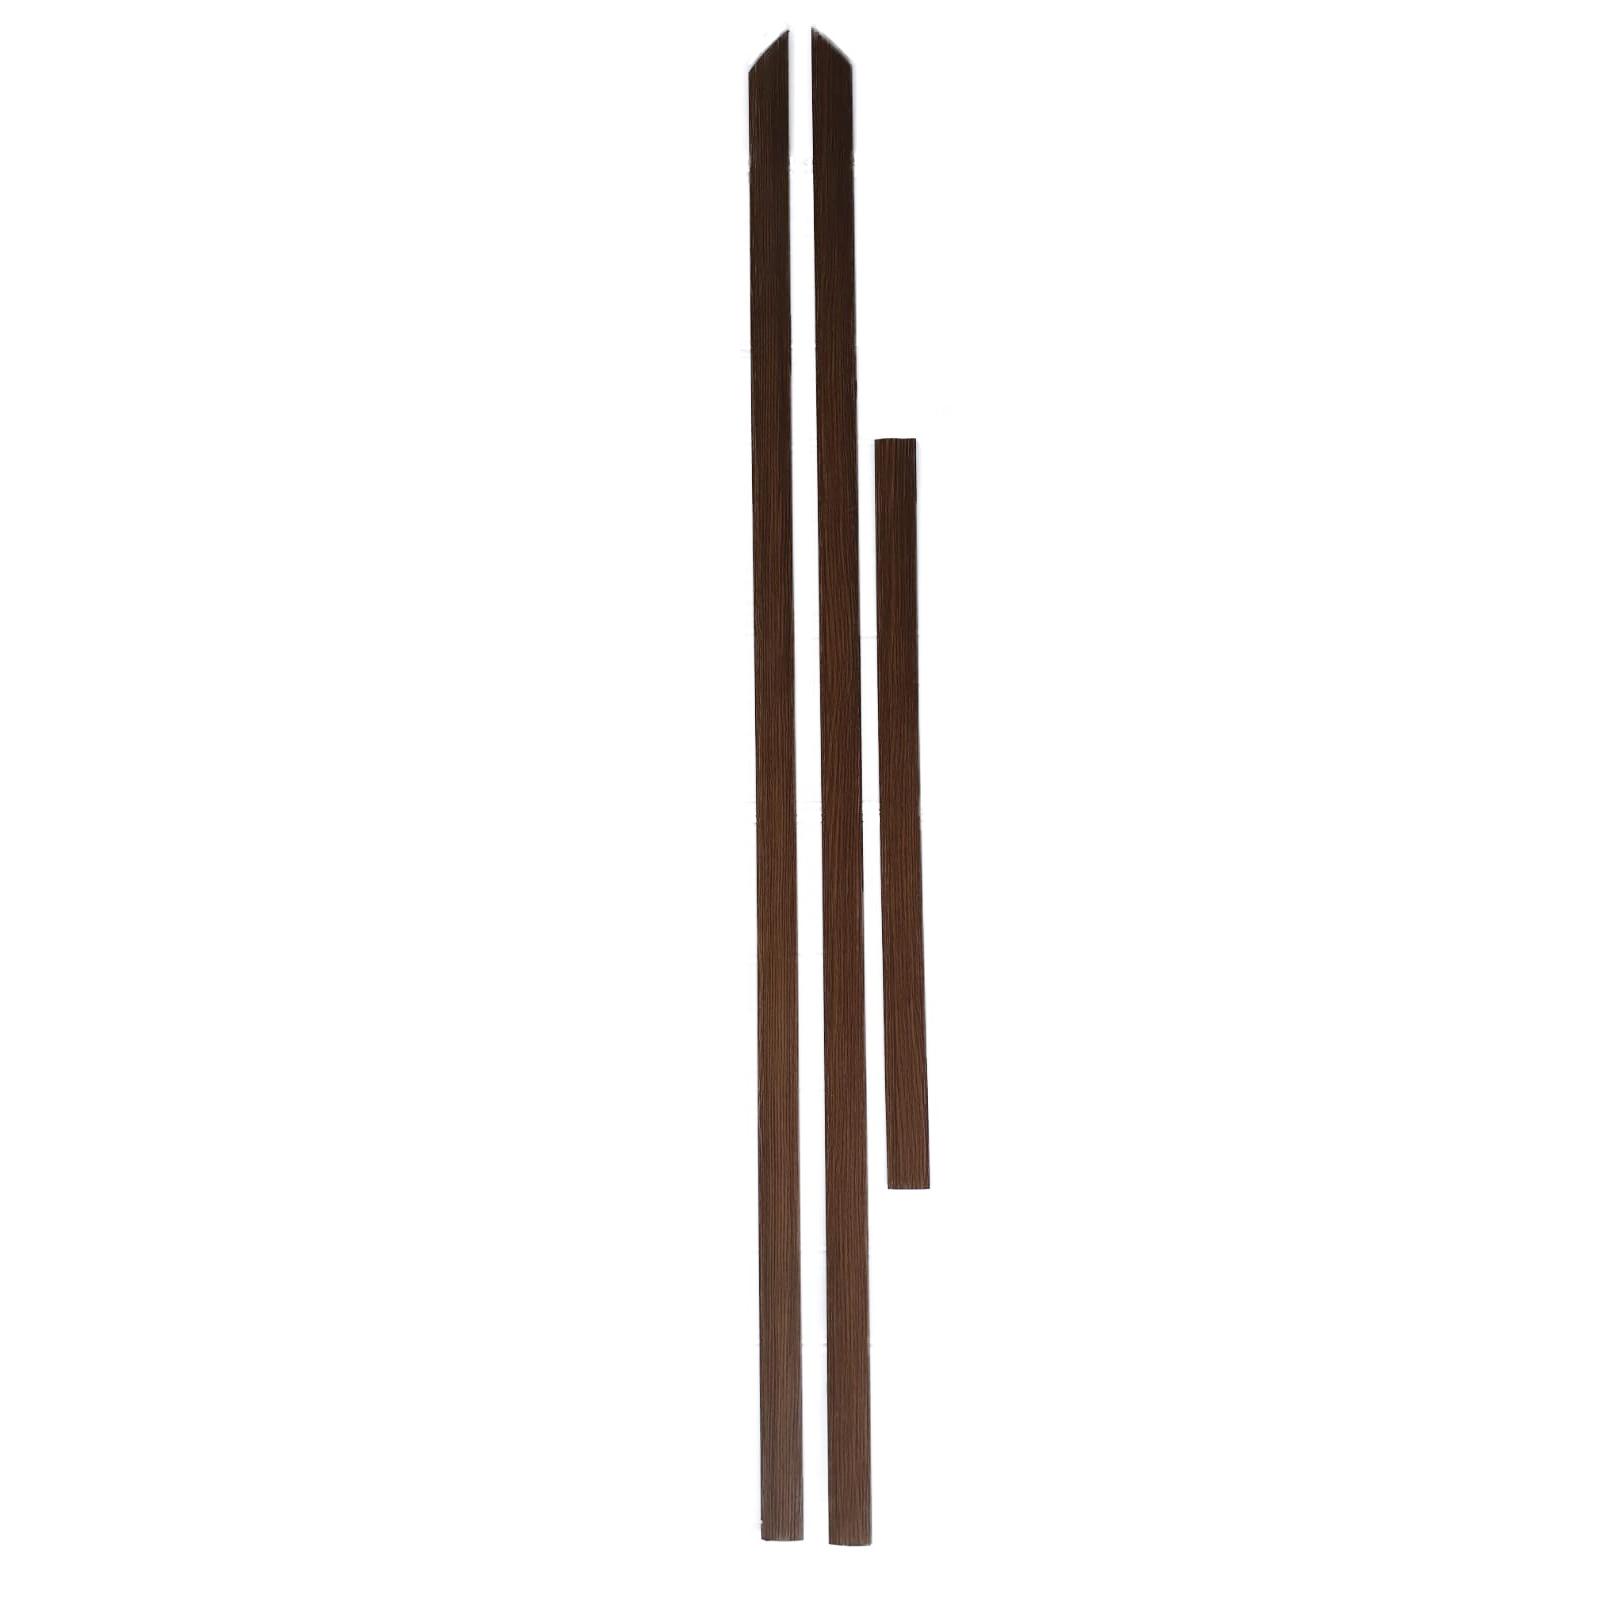 Pervaz usa interior Pamate stejar auriu, 6 x 0,5 cm mathaus 2021